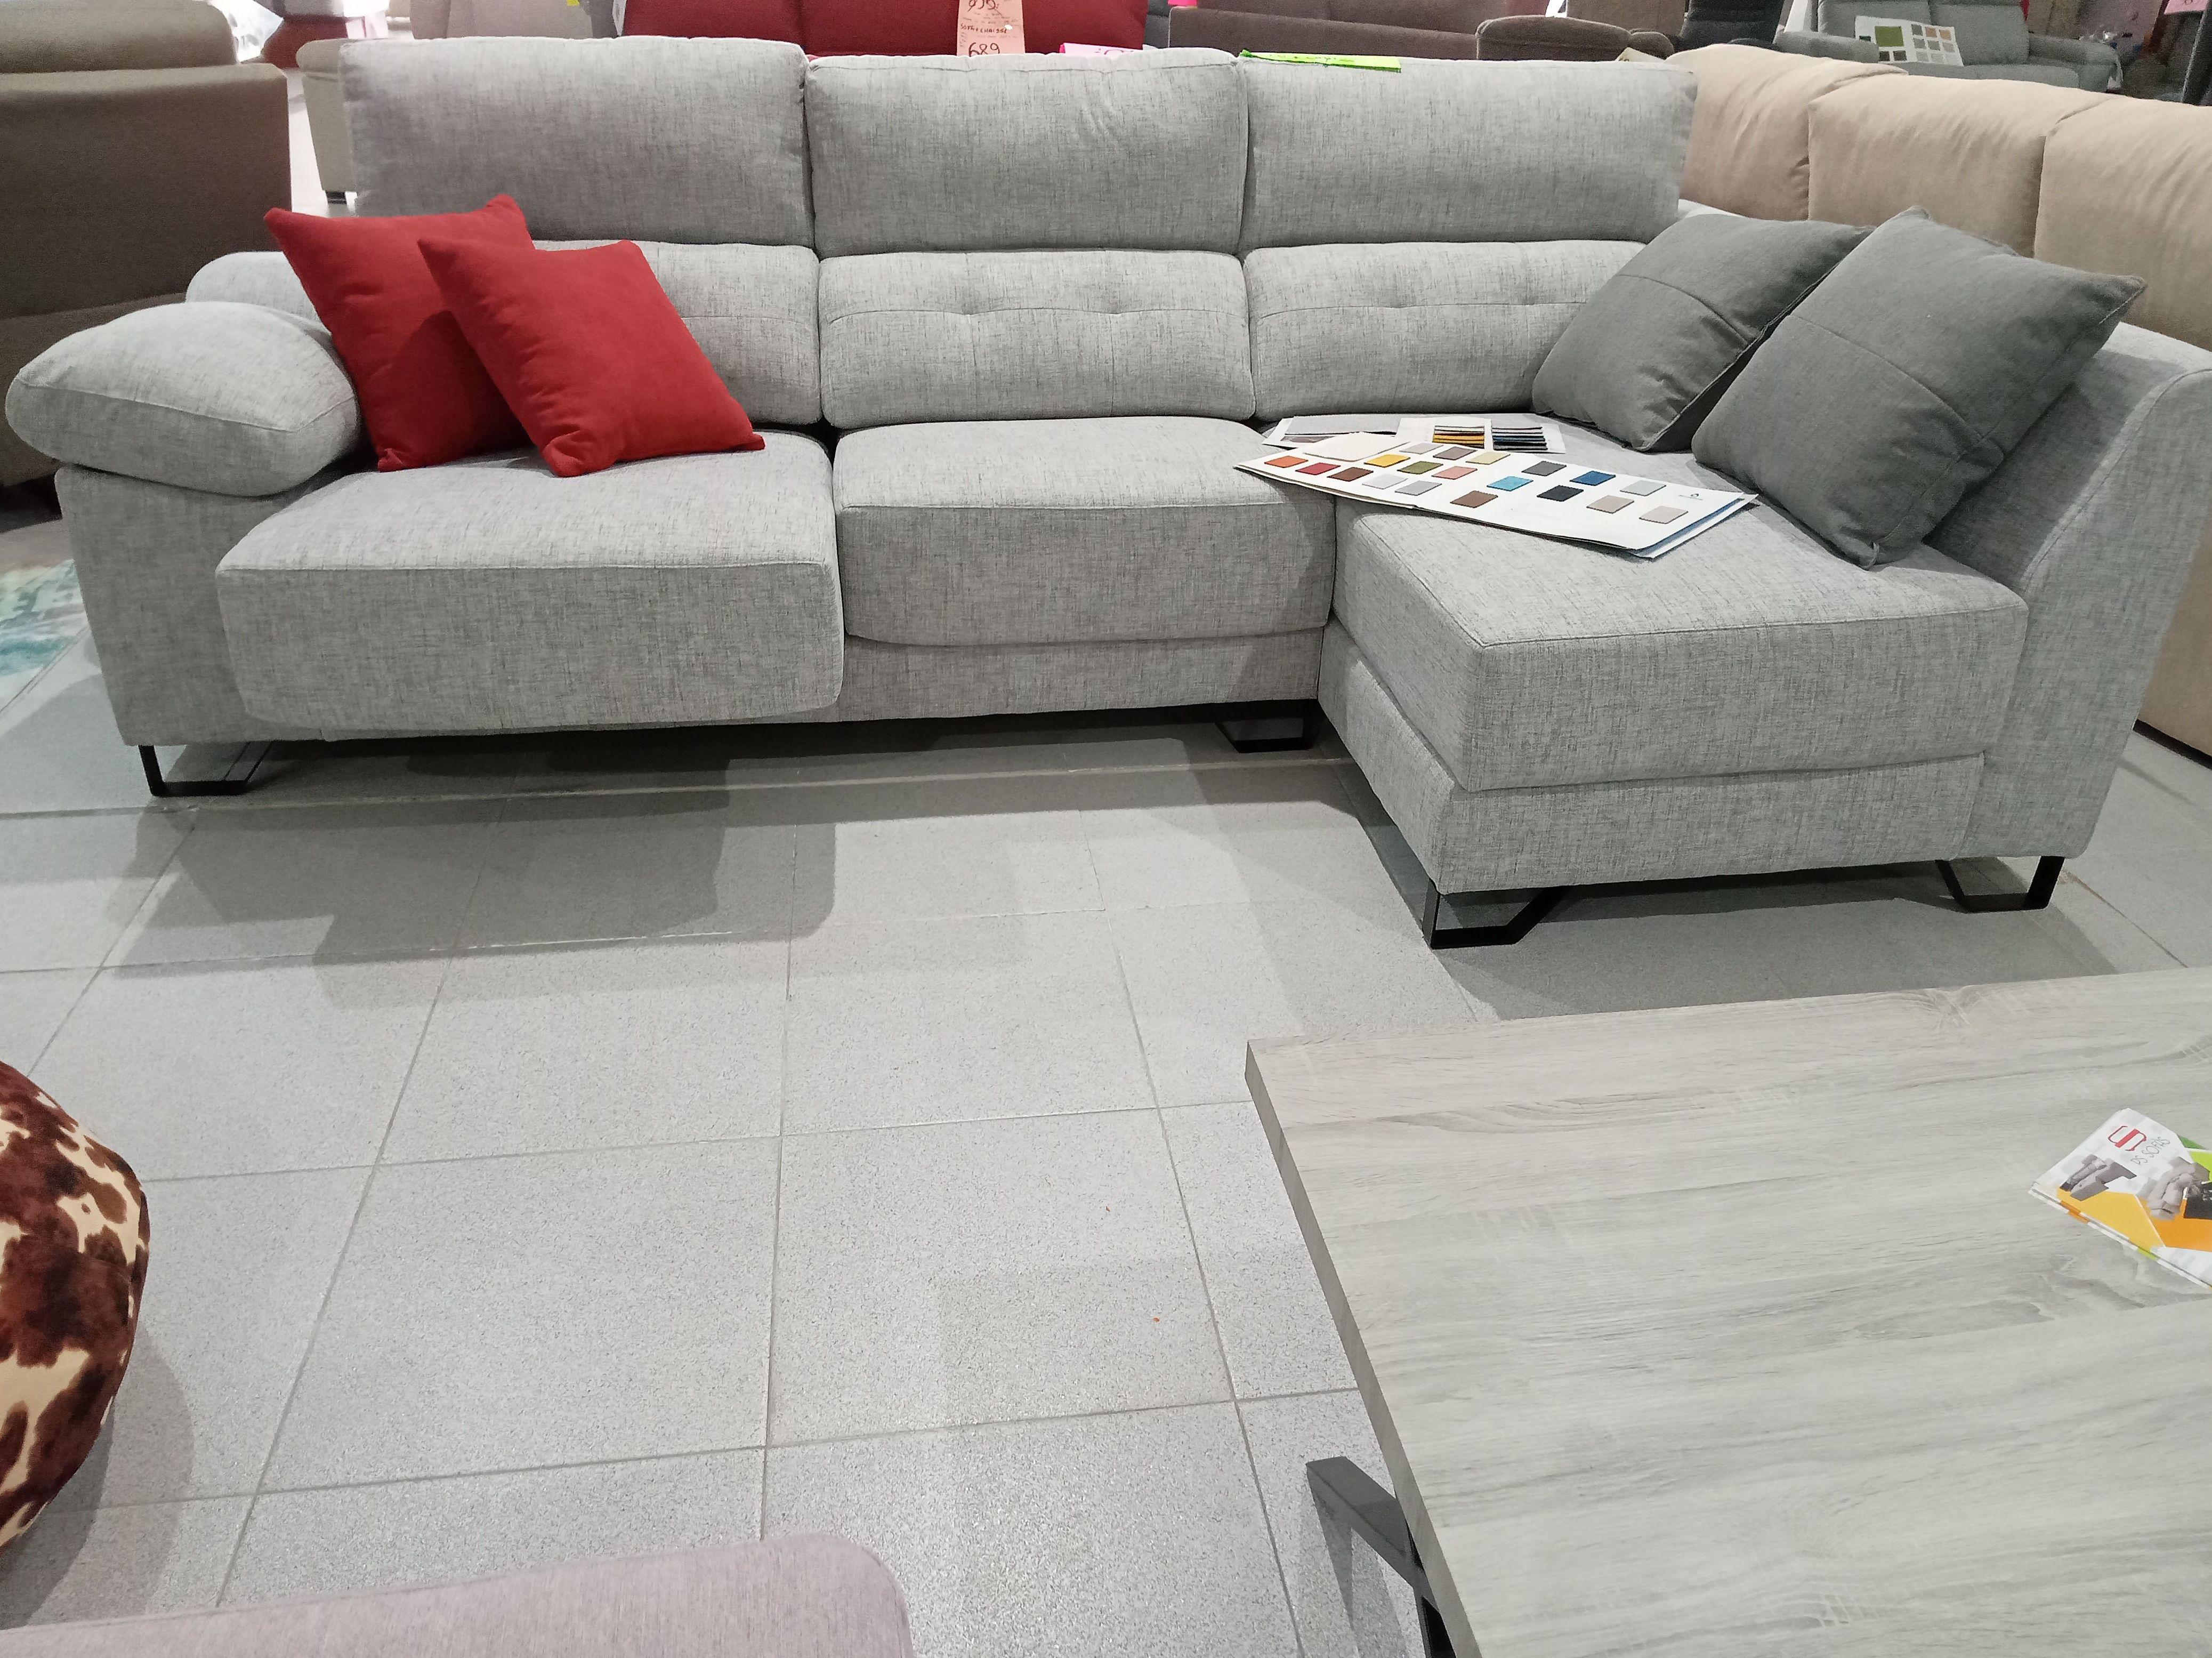 Foto 6 de Colchones, sofás y canapés en  | PS Sofás